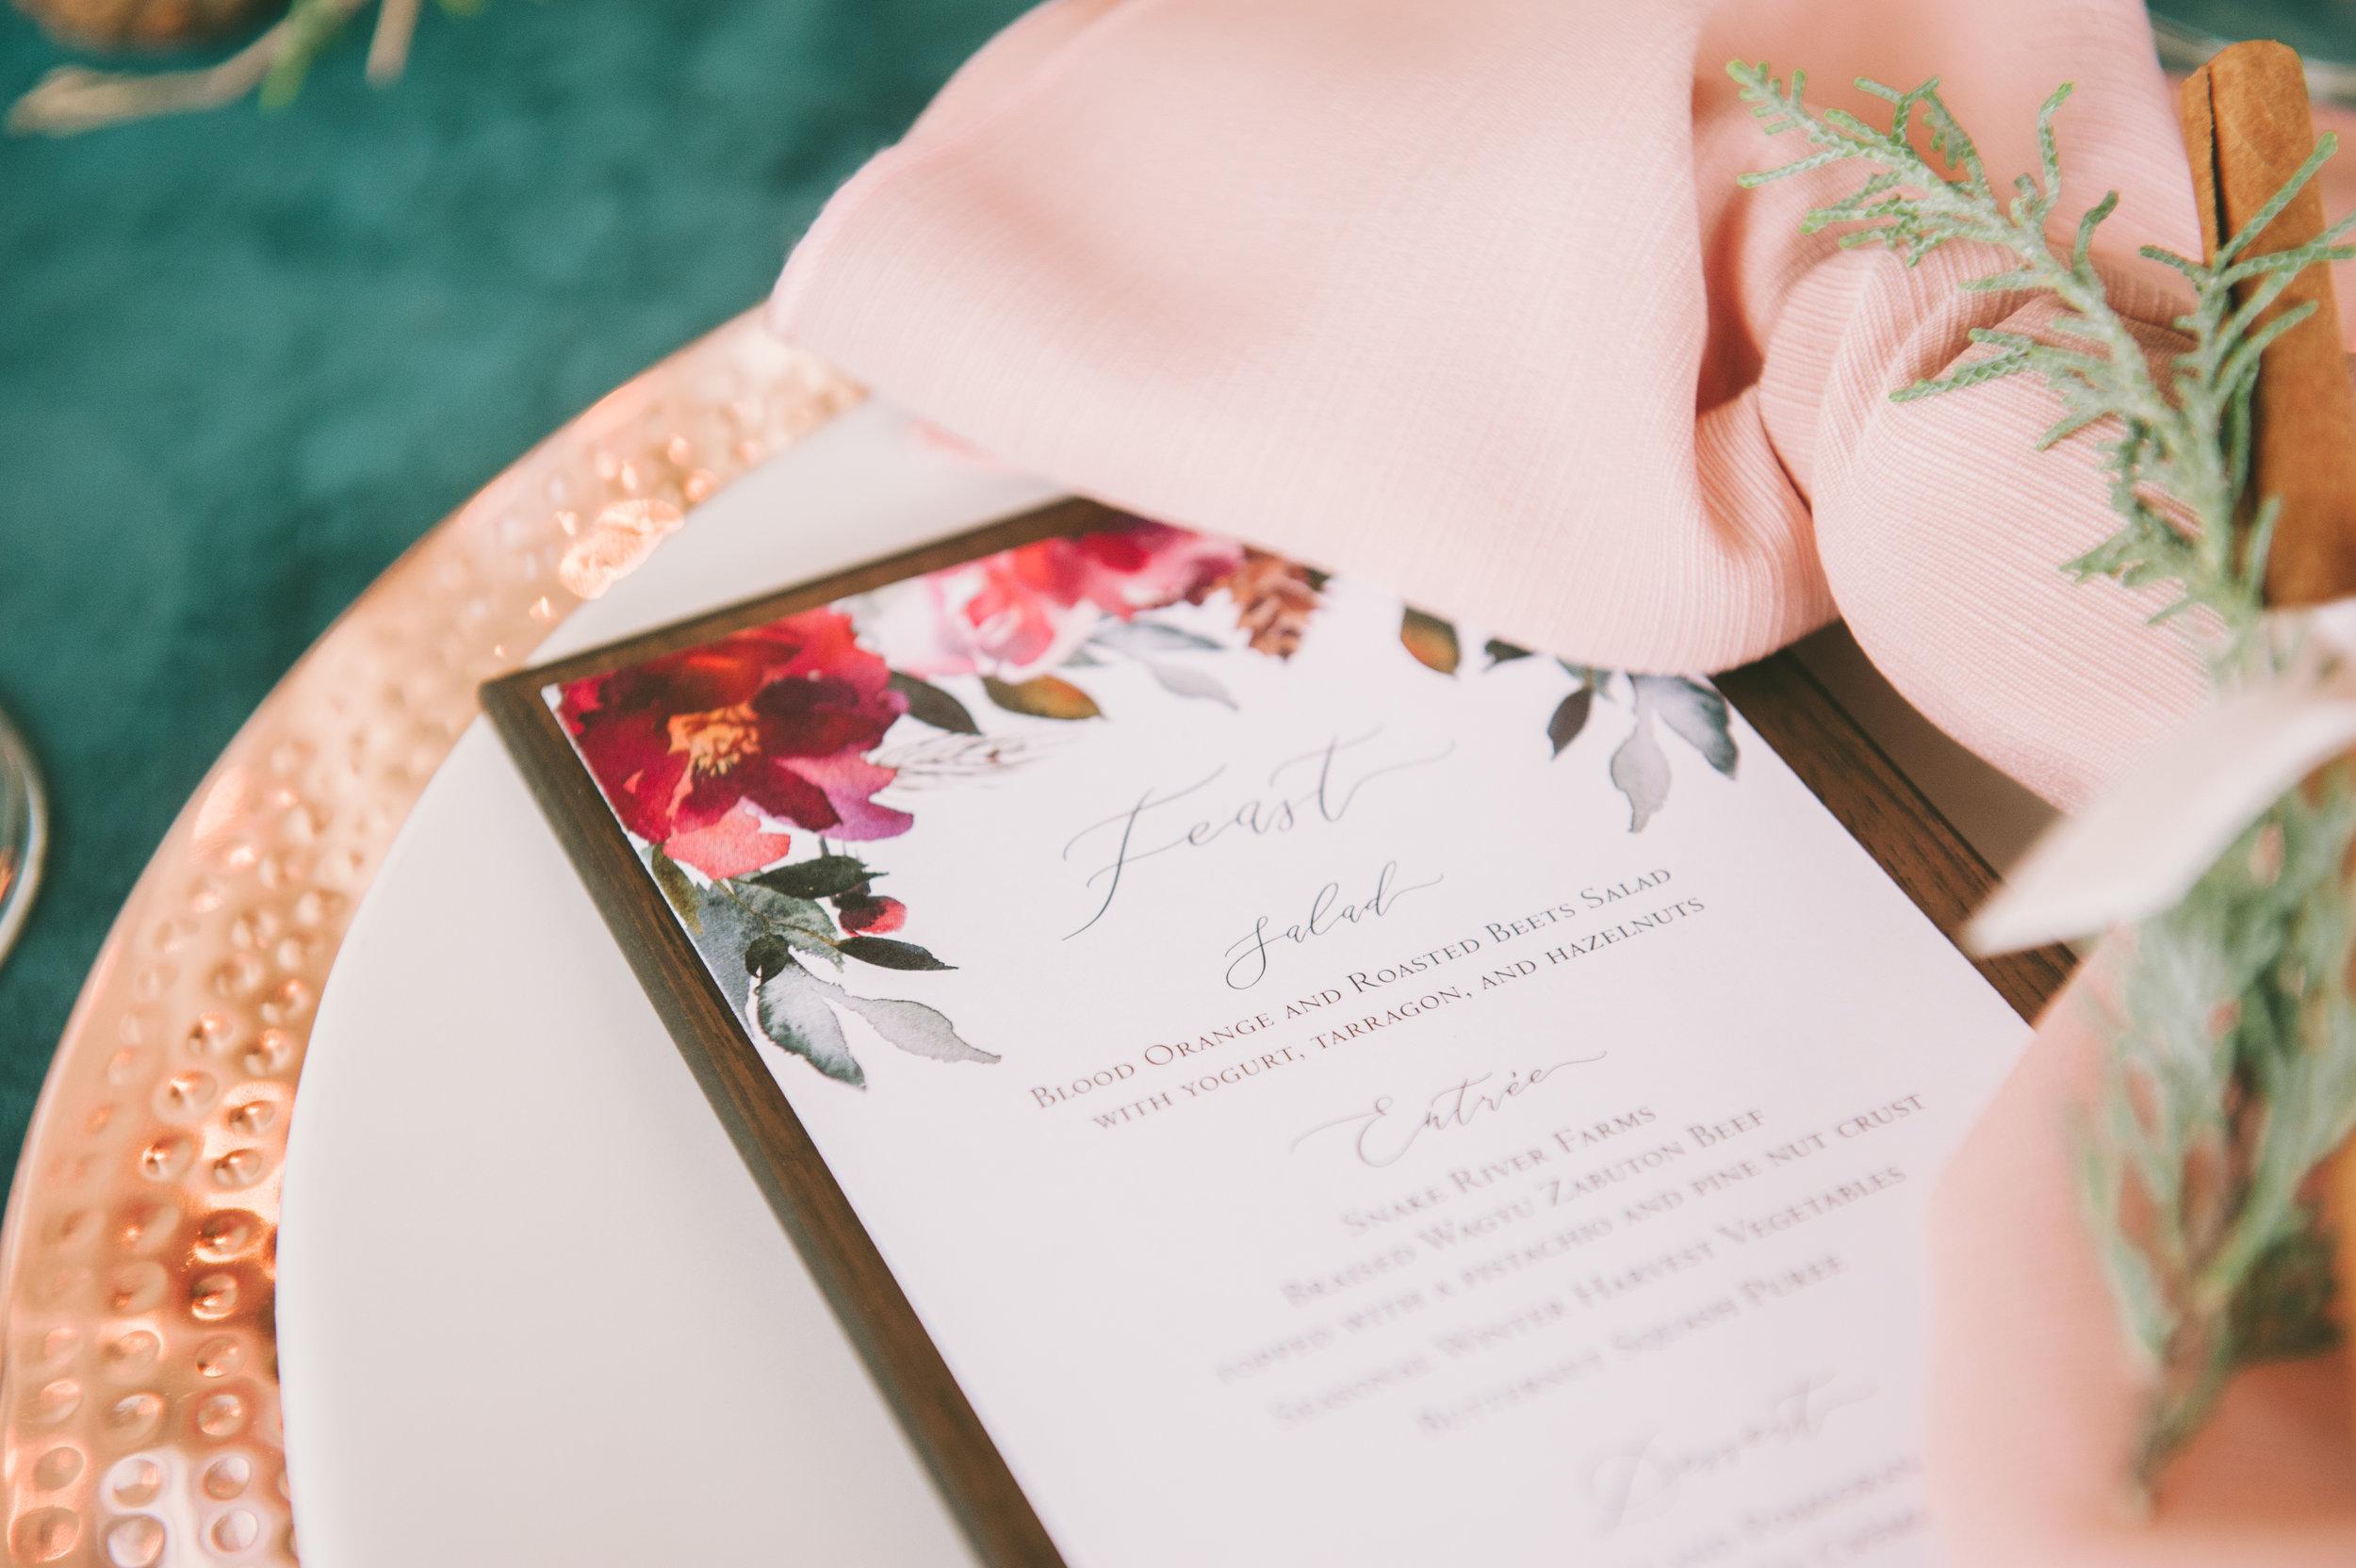 Winter Wedding Inspiration | Burgundy Wedding | Emerald Green Decor | Utah Bride & Groom Magazine | Michelle Leo Events | Utah Event Planner and Designer | Rebekah Westover Photography